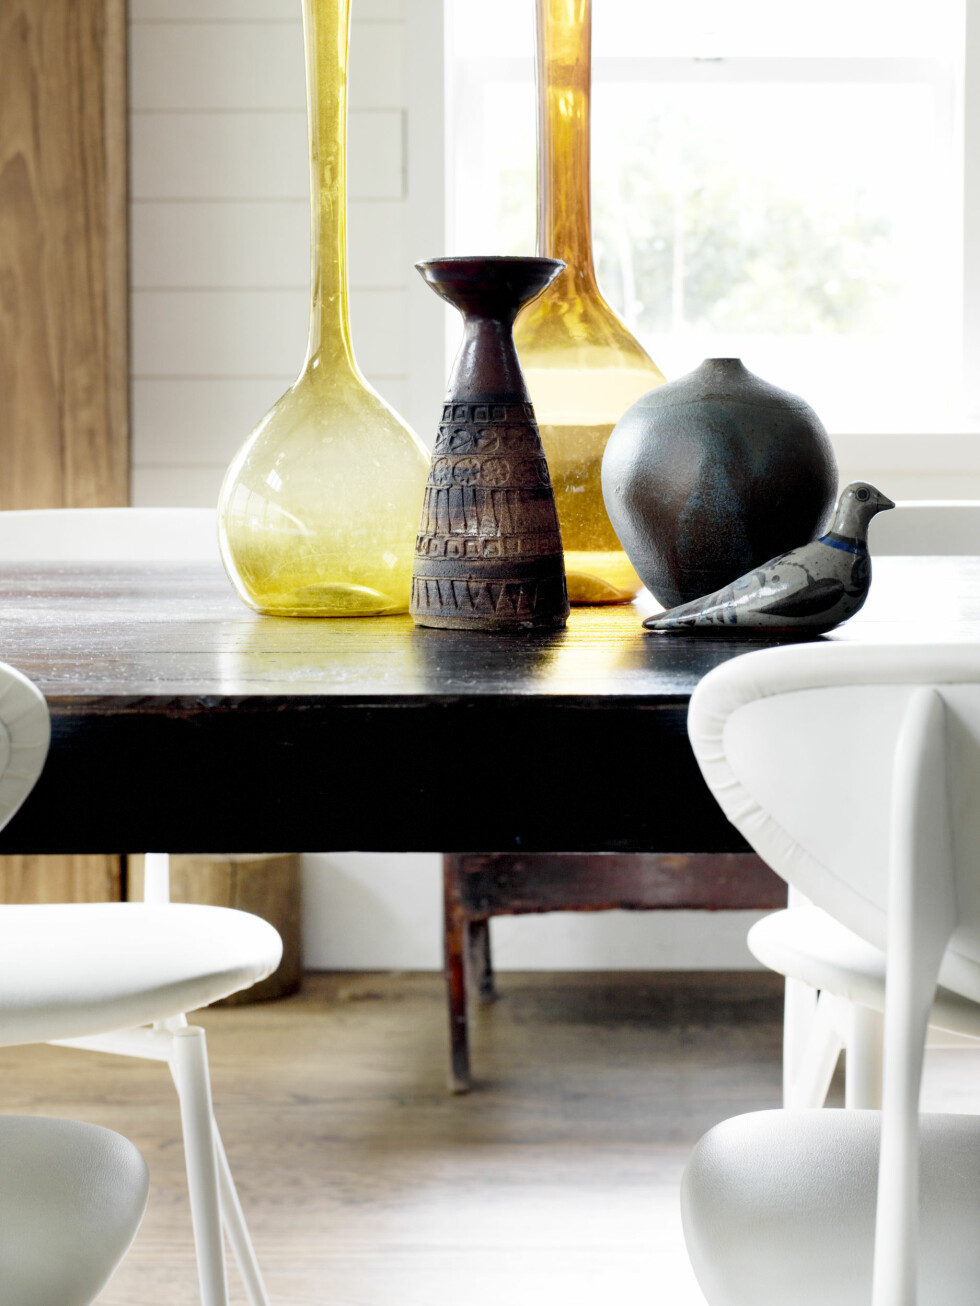 Spisebordet. Fugl i keramikk, vintage. Foto: Prue Ruscoe/Taverne Agency